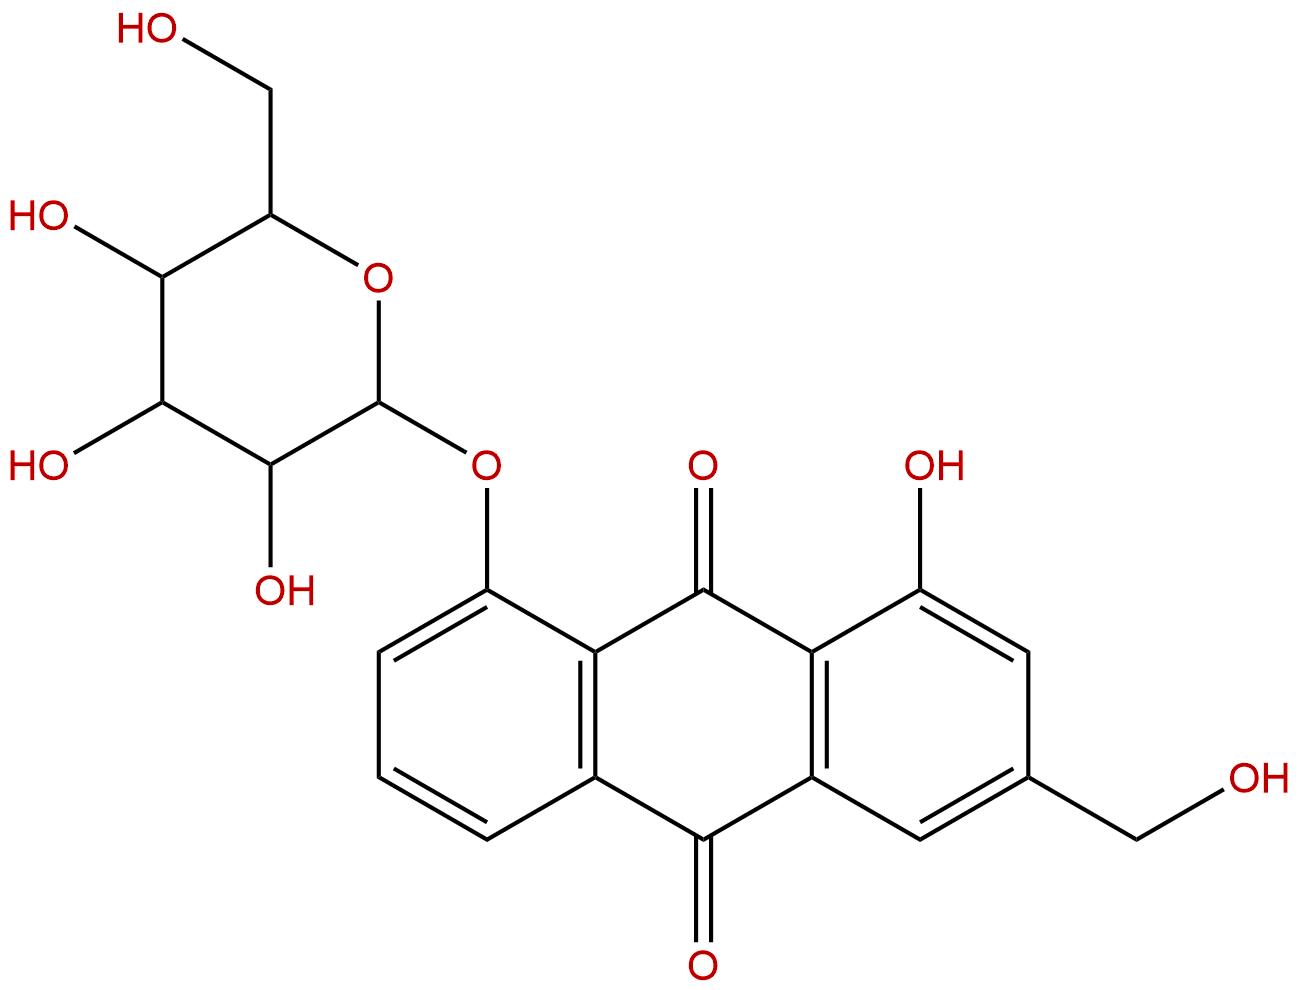 Aloe-emodin-8-O-beta-D-glucopyranoside